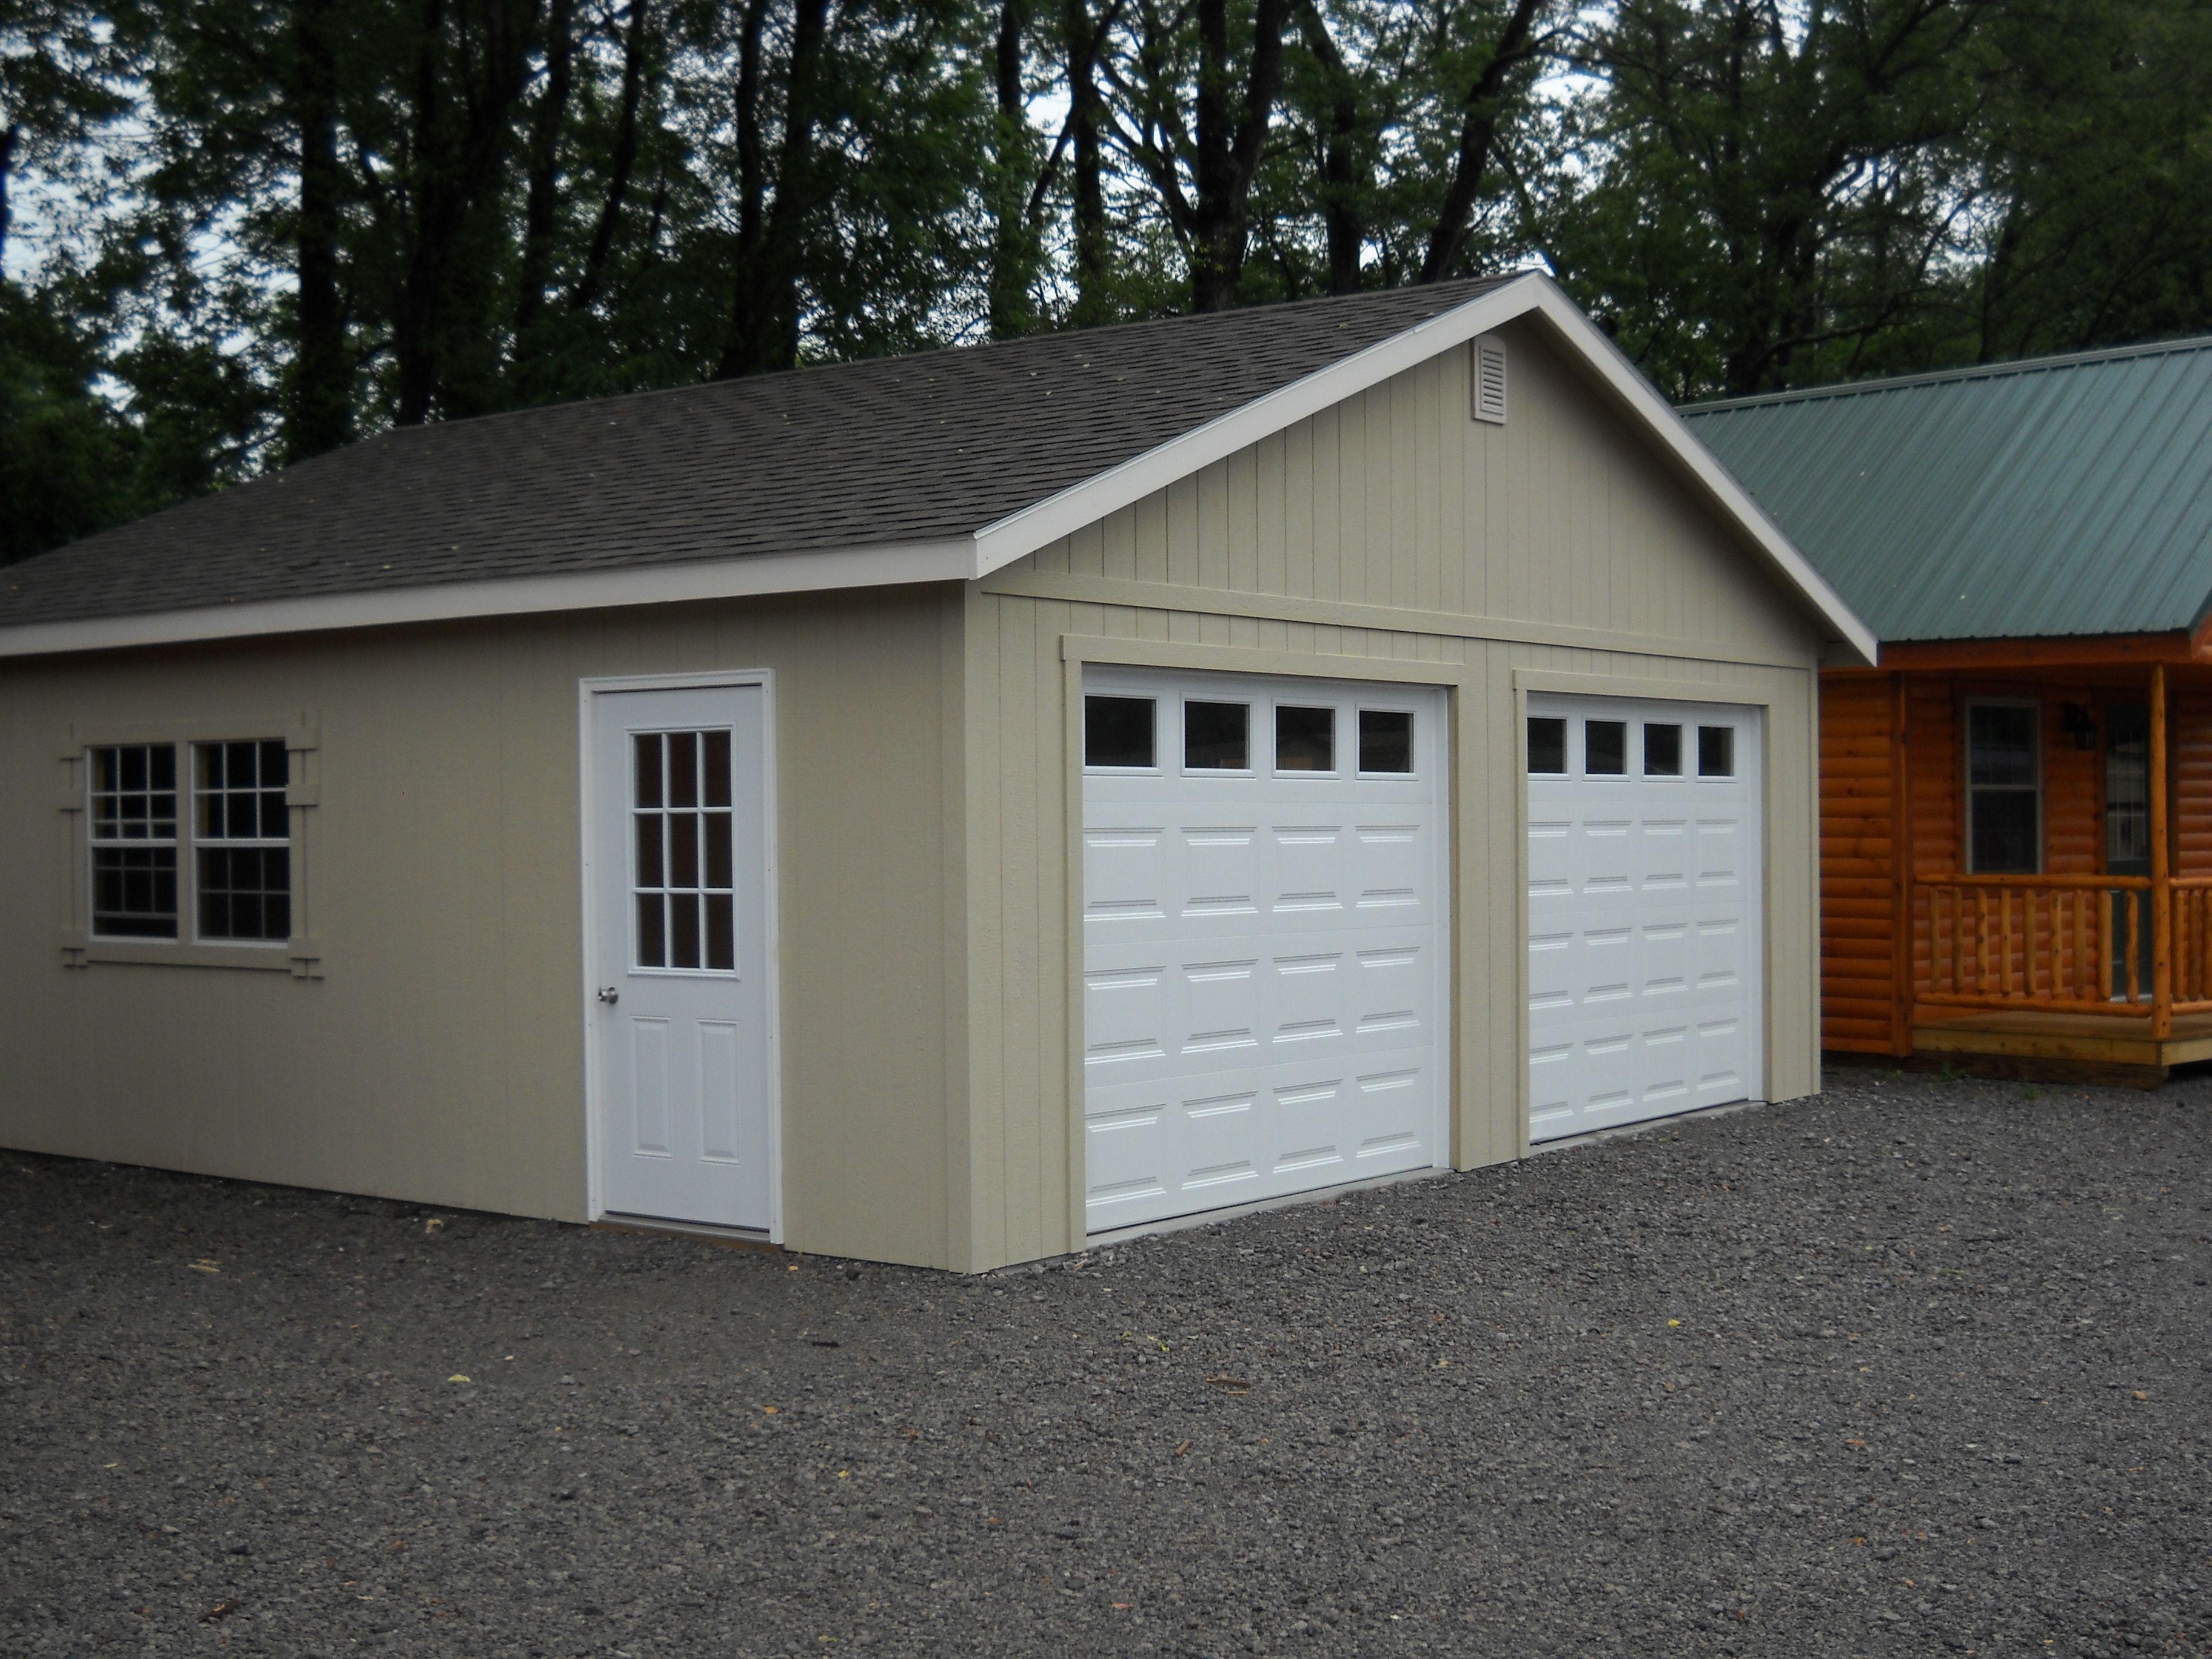 Custom Built Garages Of All Sizes Amish Built 2 Story Garages Custom Built Garages Sales Prices Garage Sale Pricing Garage Door Types Garage Building Plans